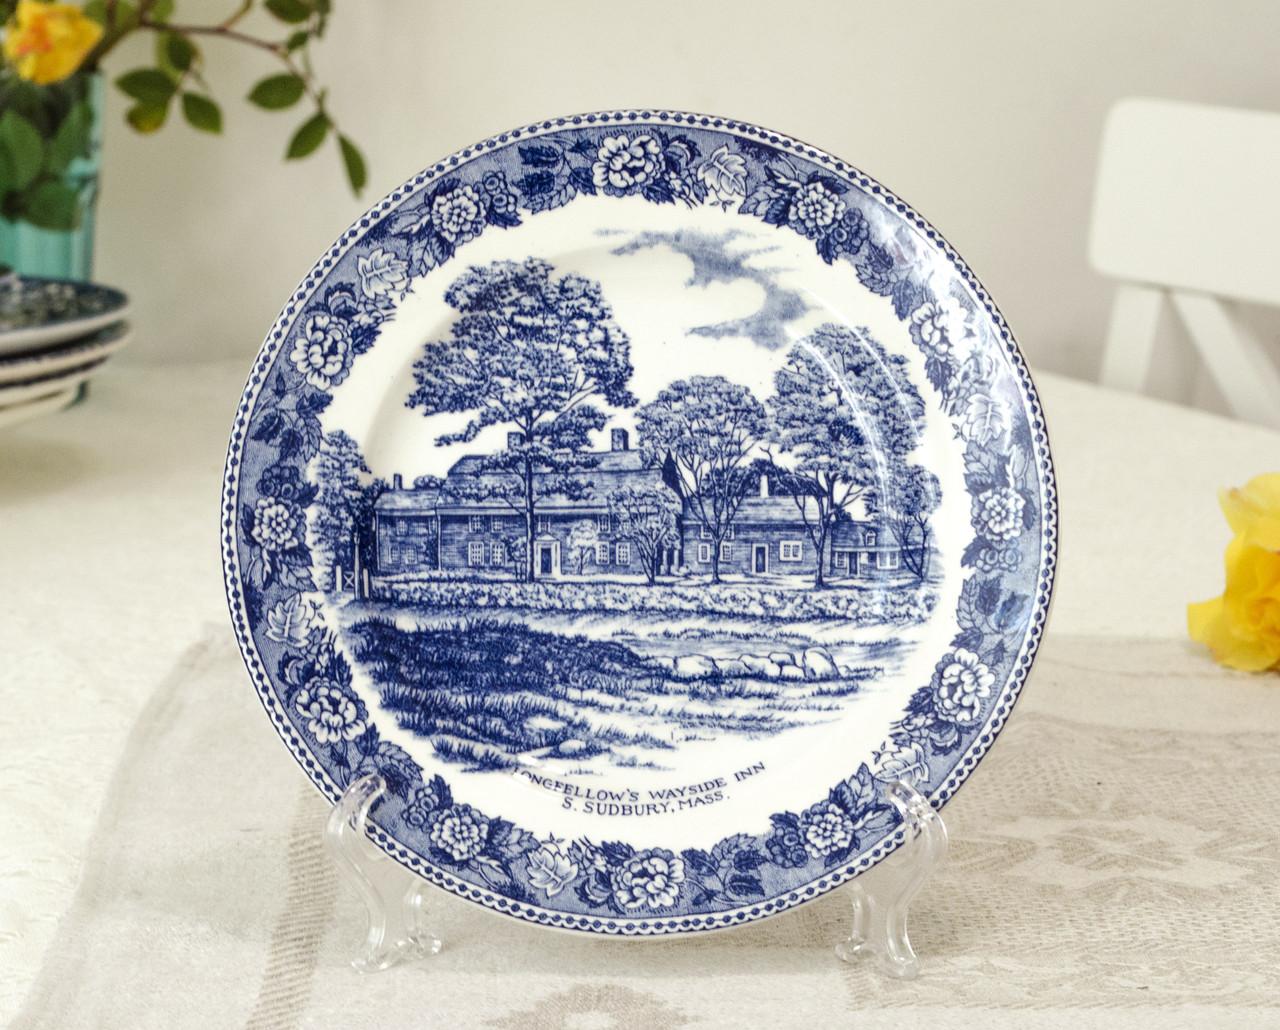 Коллекционная фарфоровая английская тарелка, Old English Staffordshire Ware, John Roth, Longfellow's Wayside